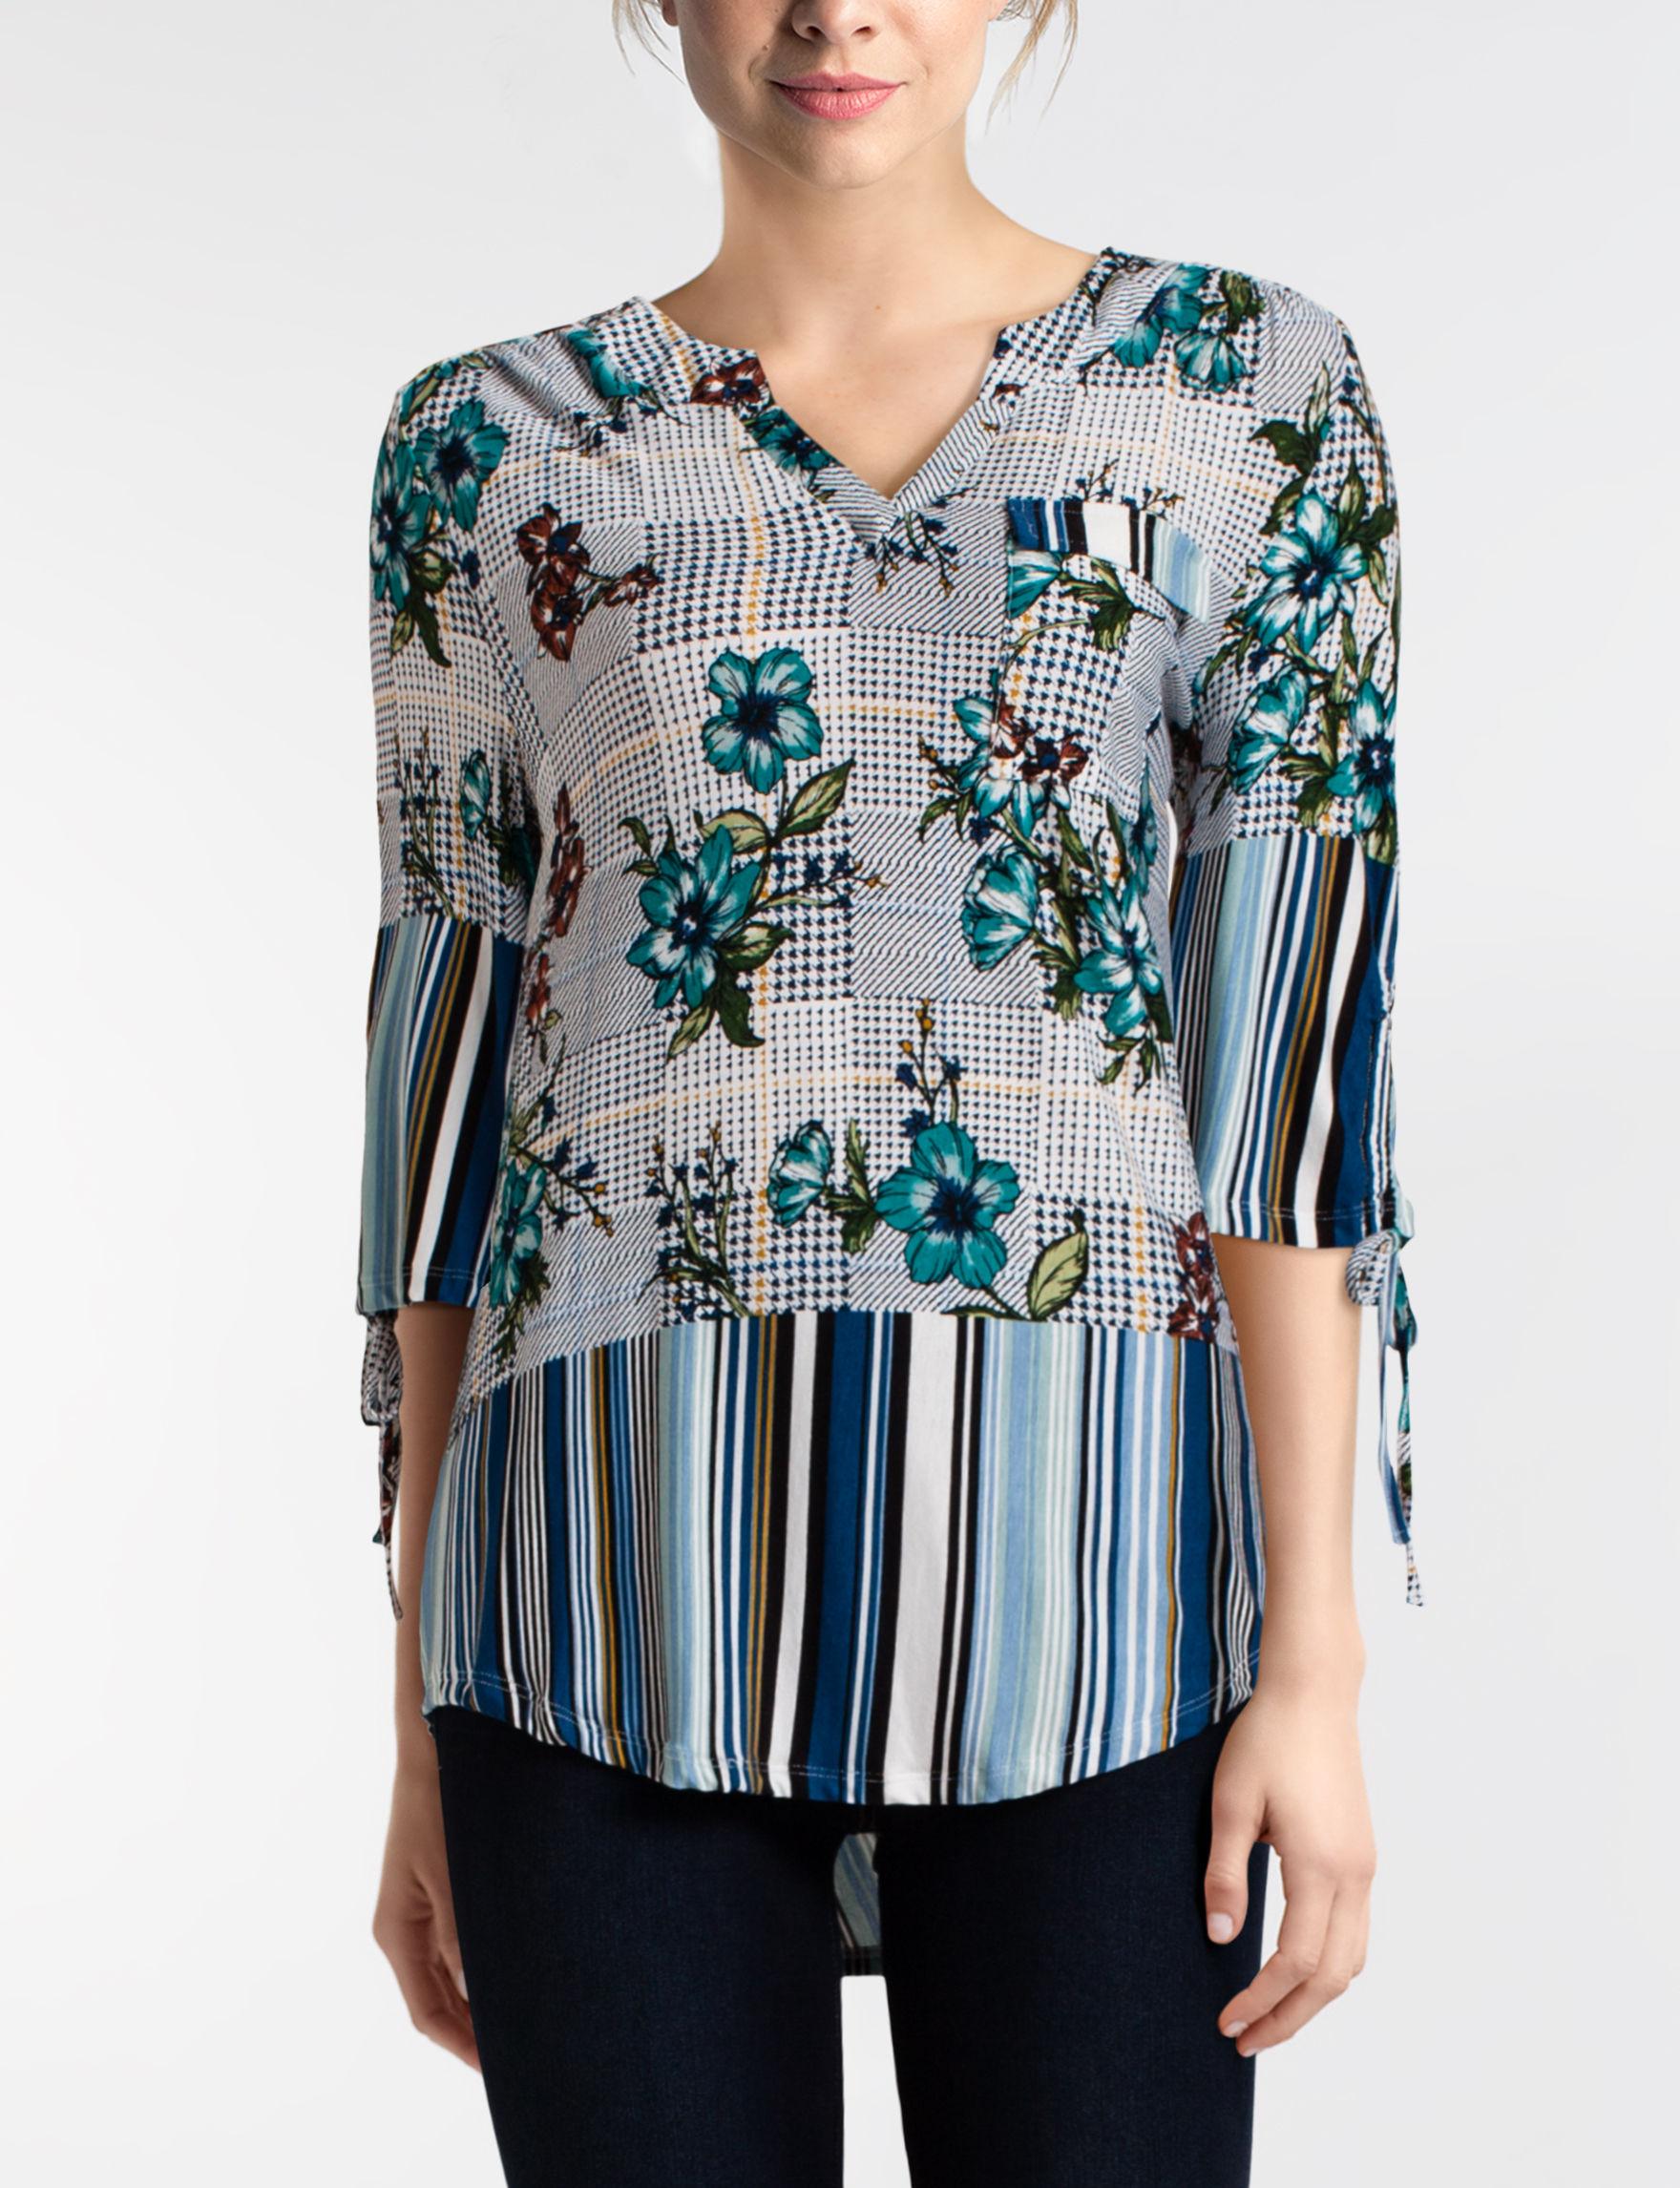 Energe Blue Multi Shirts & Blouses